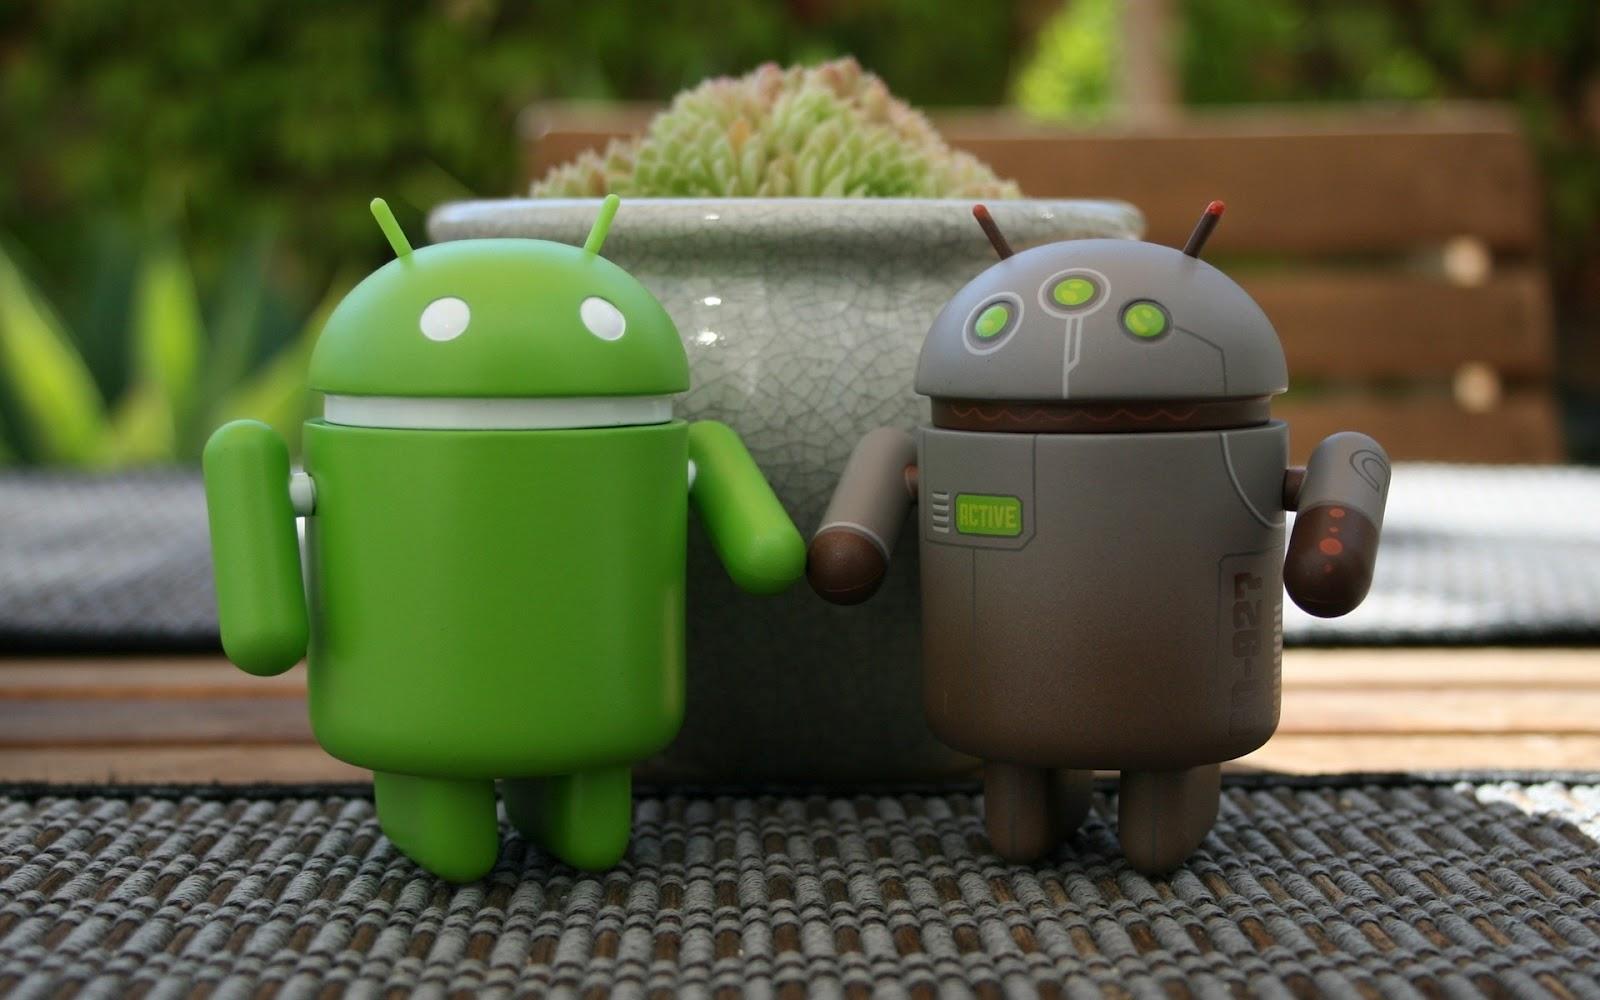 http://4.bp.blogspot.com/-_tGey8CZUVk/T8xlwUE7blI/AAAAAAAAekA/i7E4FA4Akoc/s1600/Google-Android-HD-Wallpapers.jpg